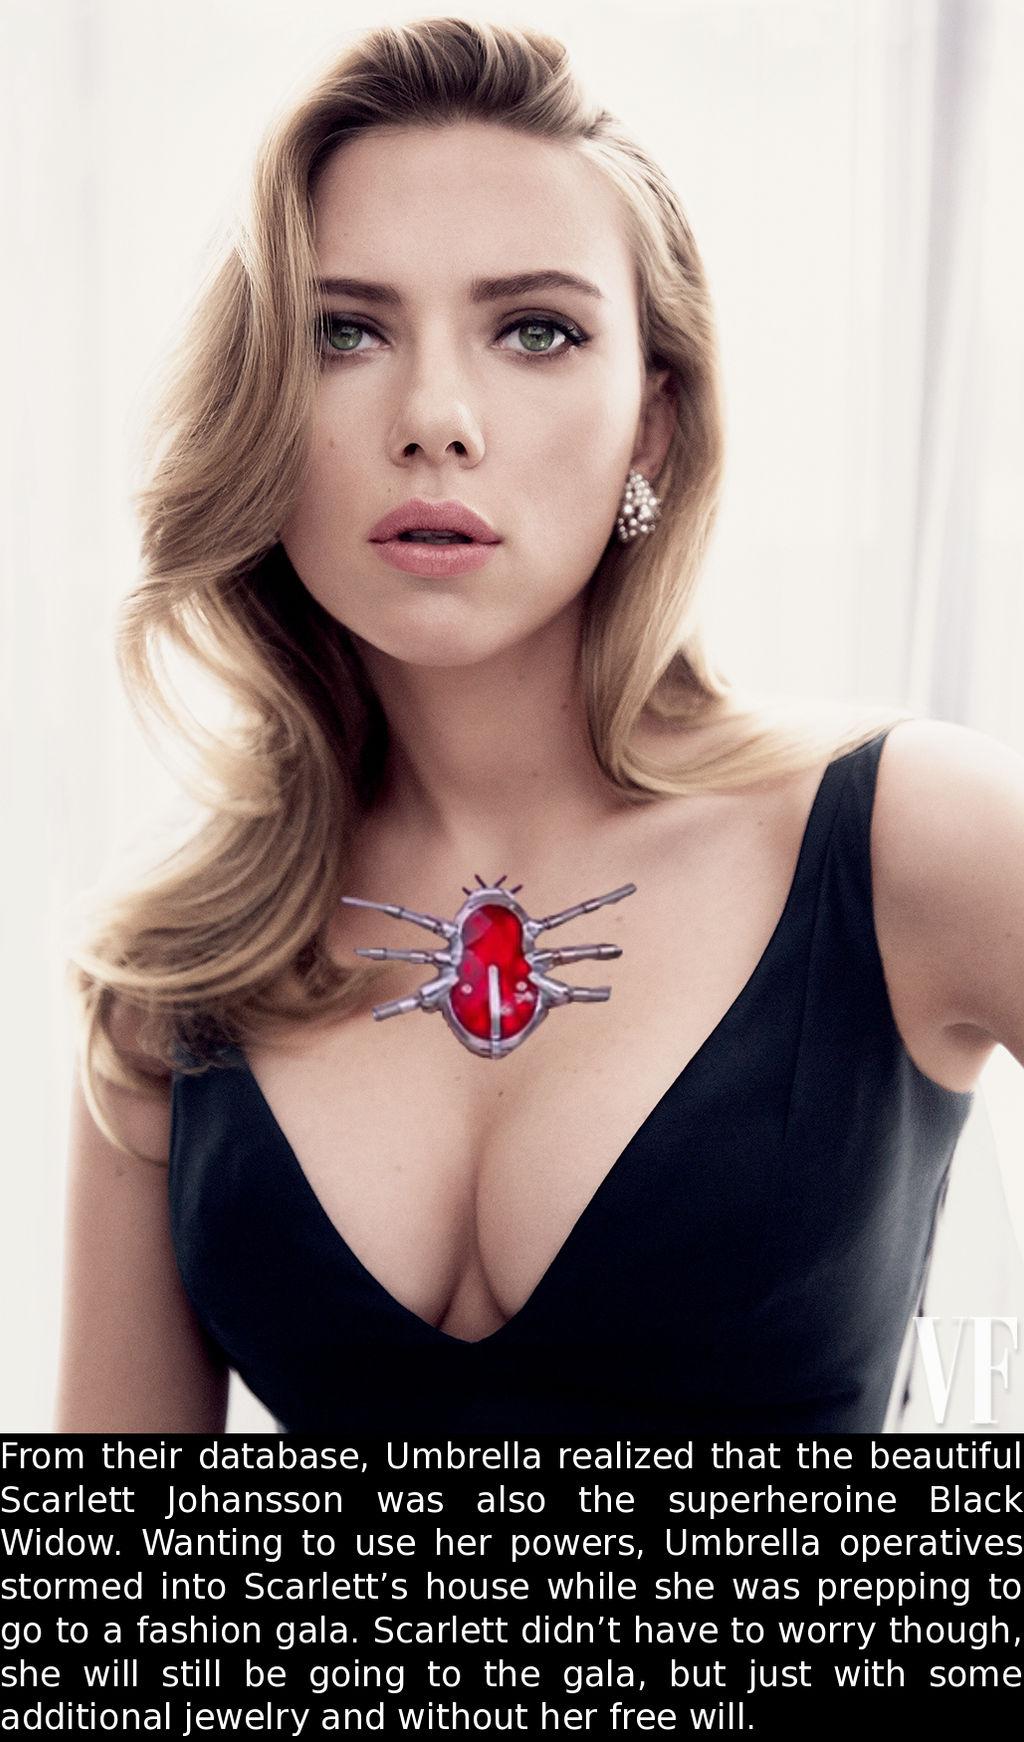 Scarab Scarlett Johansson By Starropinder On Deviantart